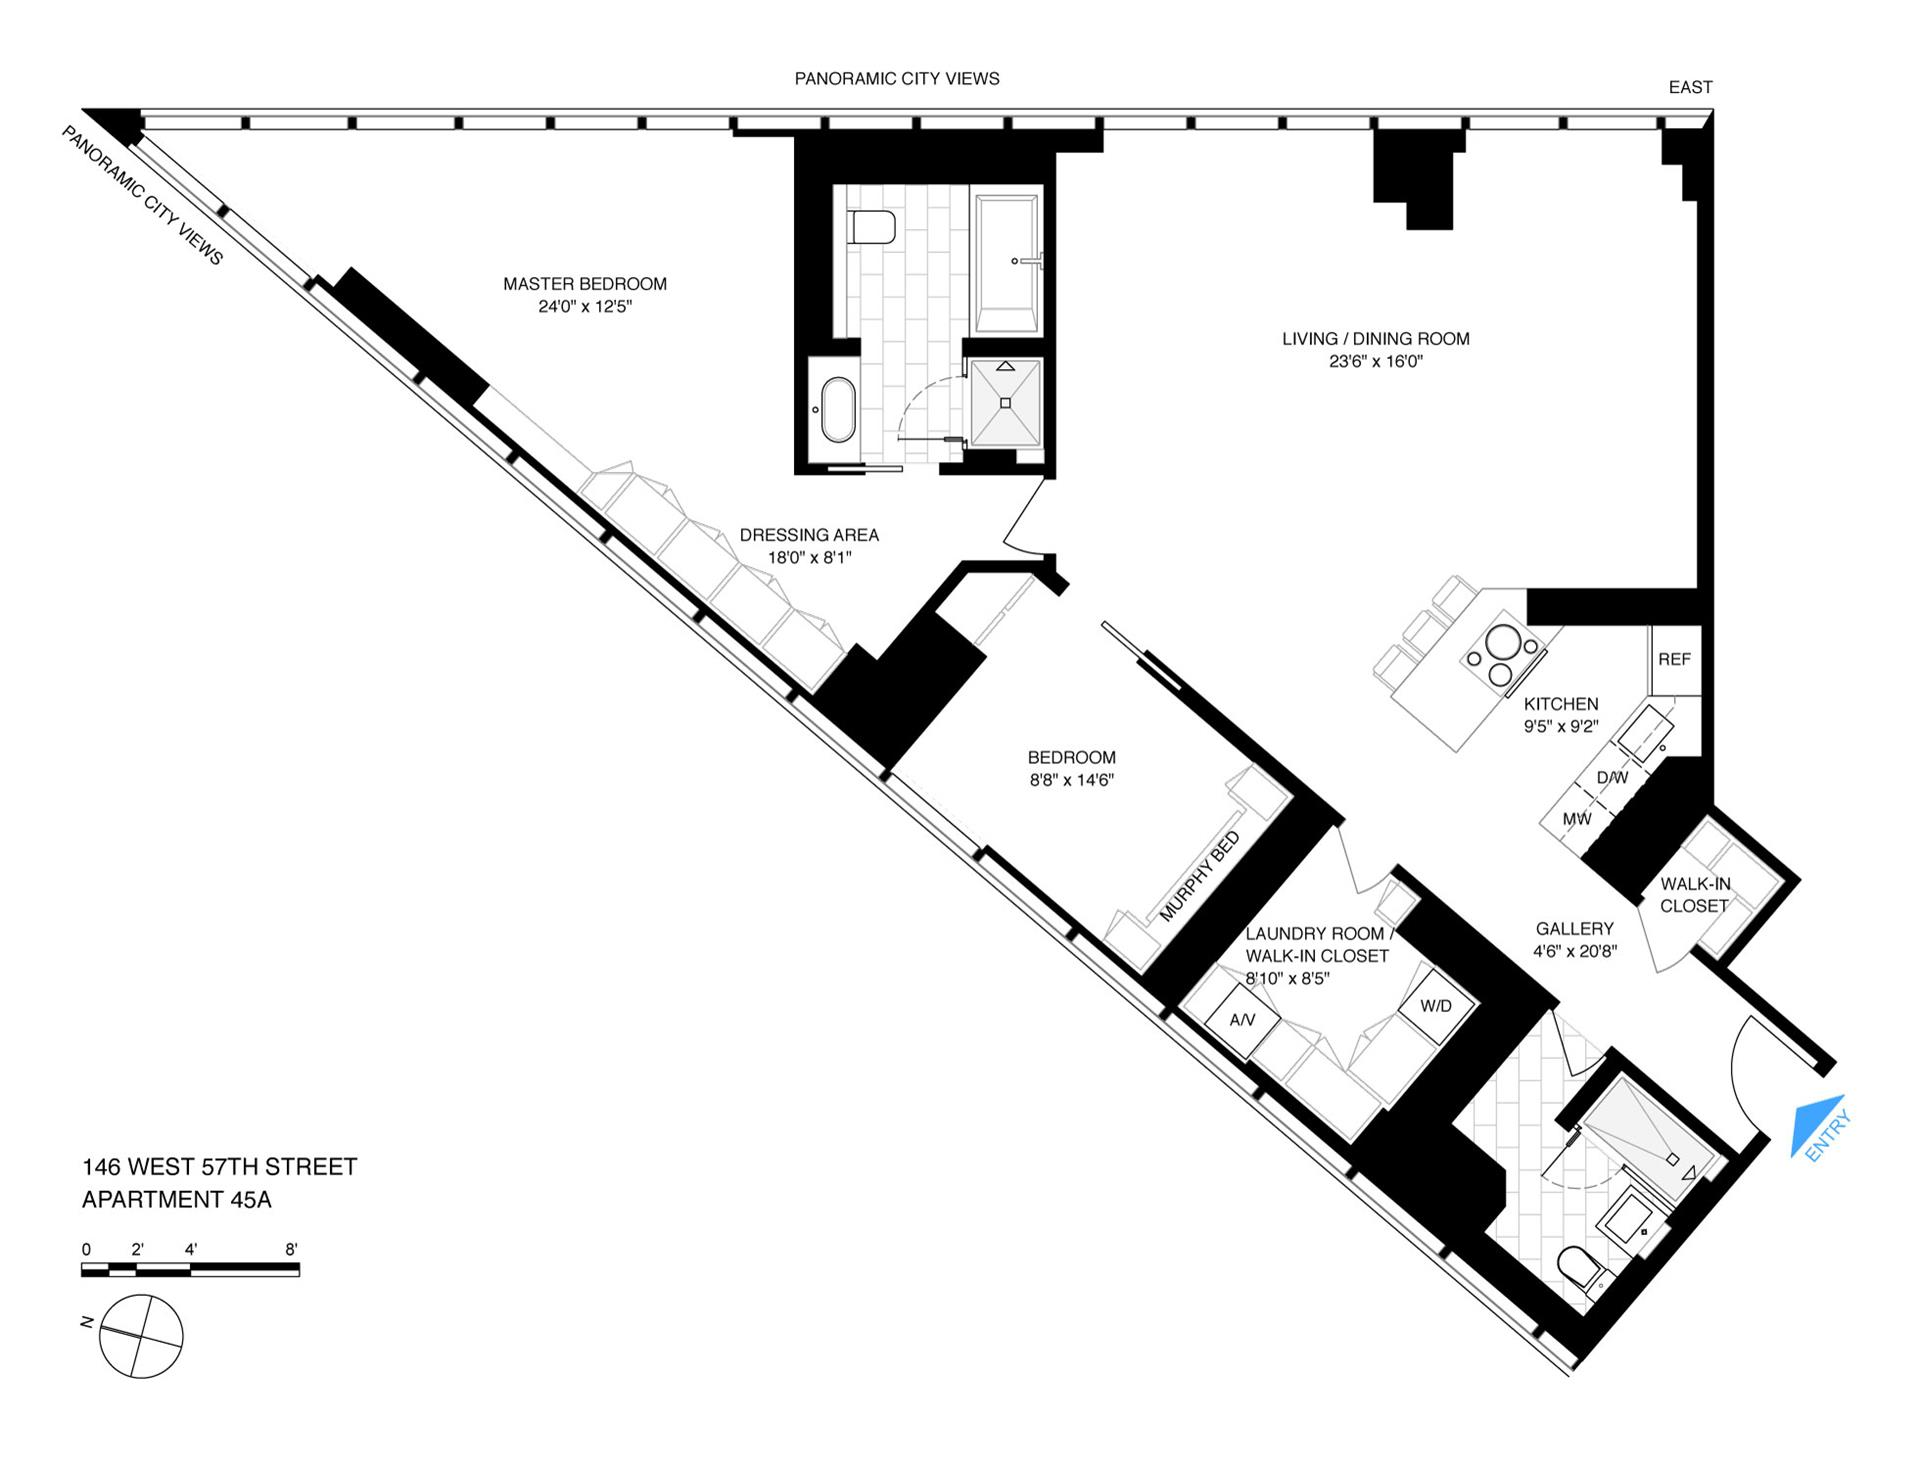 Floor plan of METROPOLITAN TOWER, 146 West 57th St, 45A - Midtown, New York